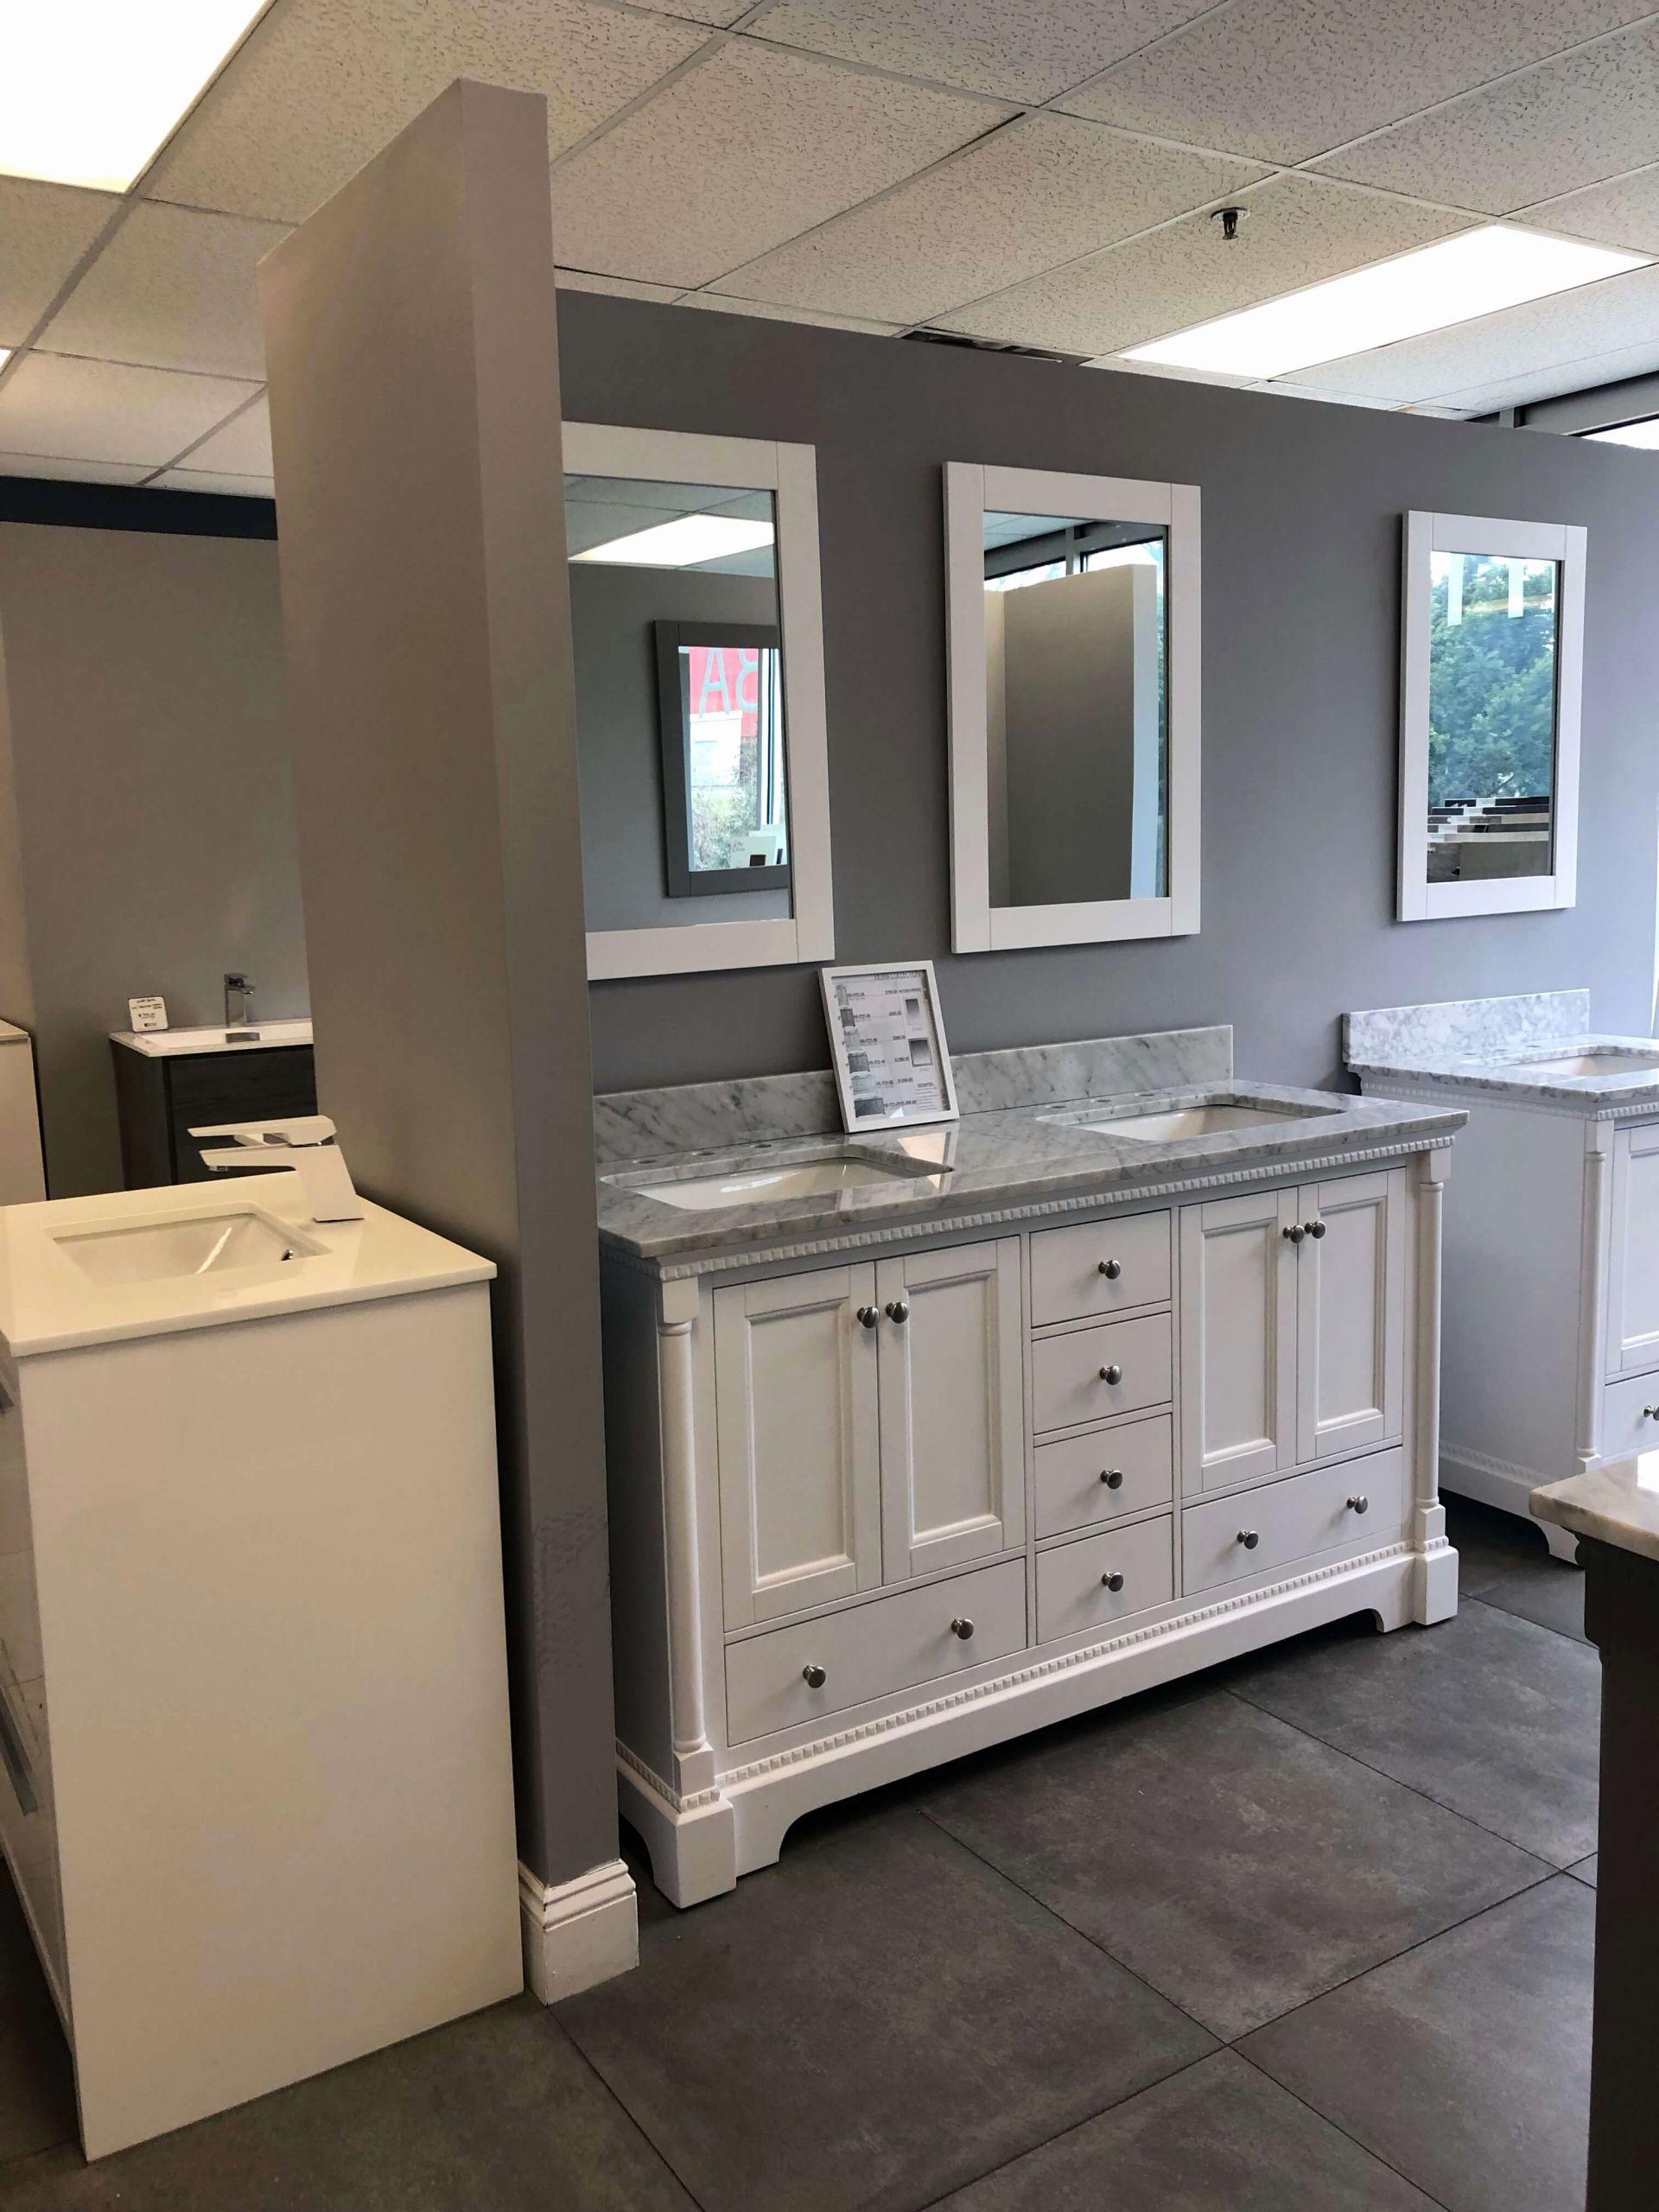 Bathroom Design New Jersey Awesome Home Design Outlet Center In 2020 Paris Bathroom Decor Bathroom Makeover Bathroom Design